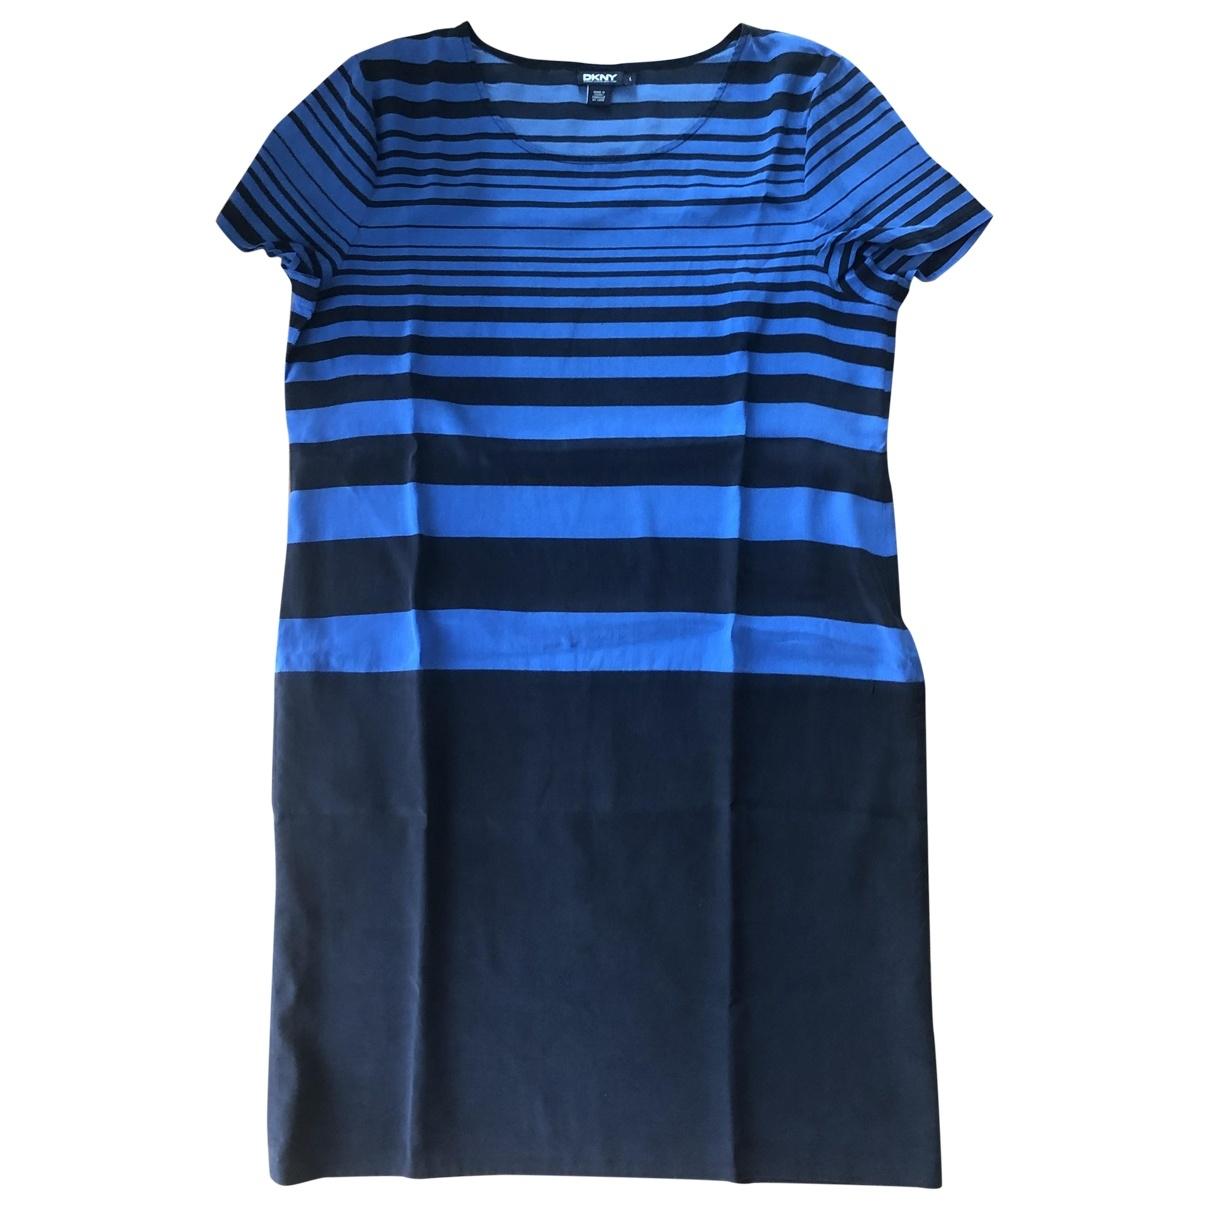 Dkny \N Blue Silk dress for Women L International